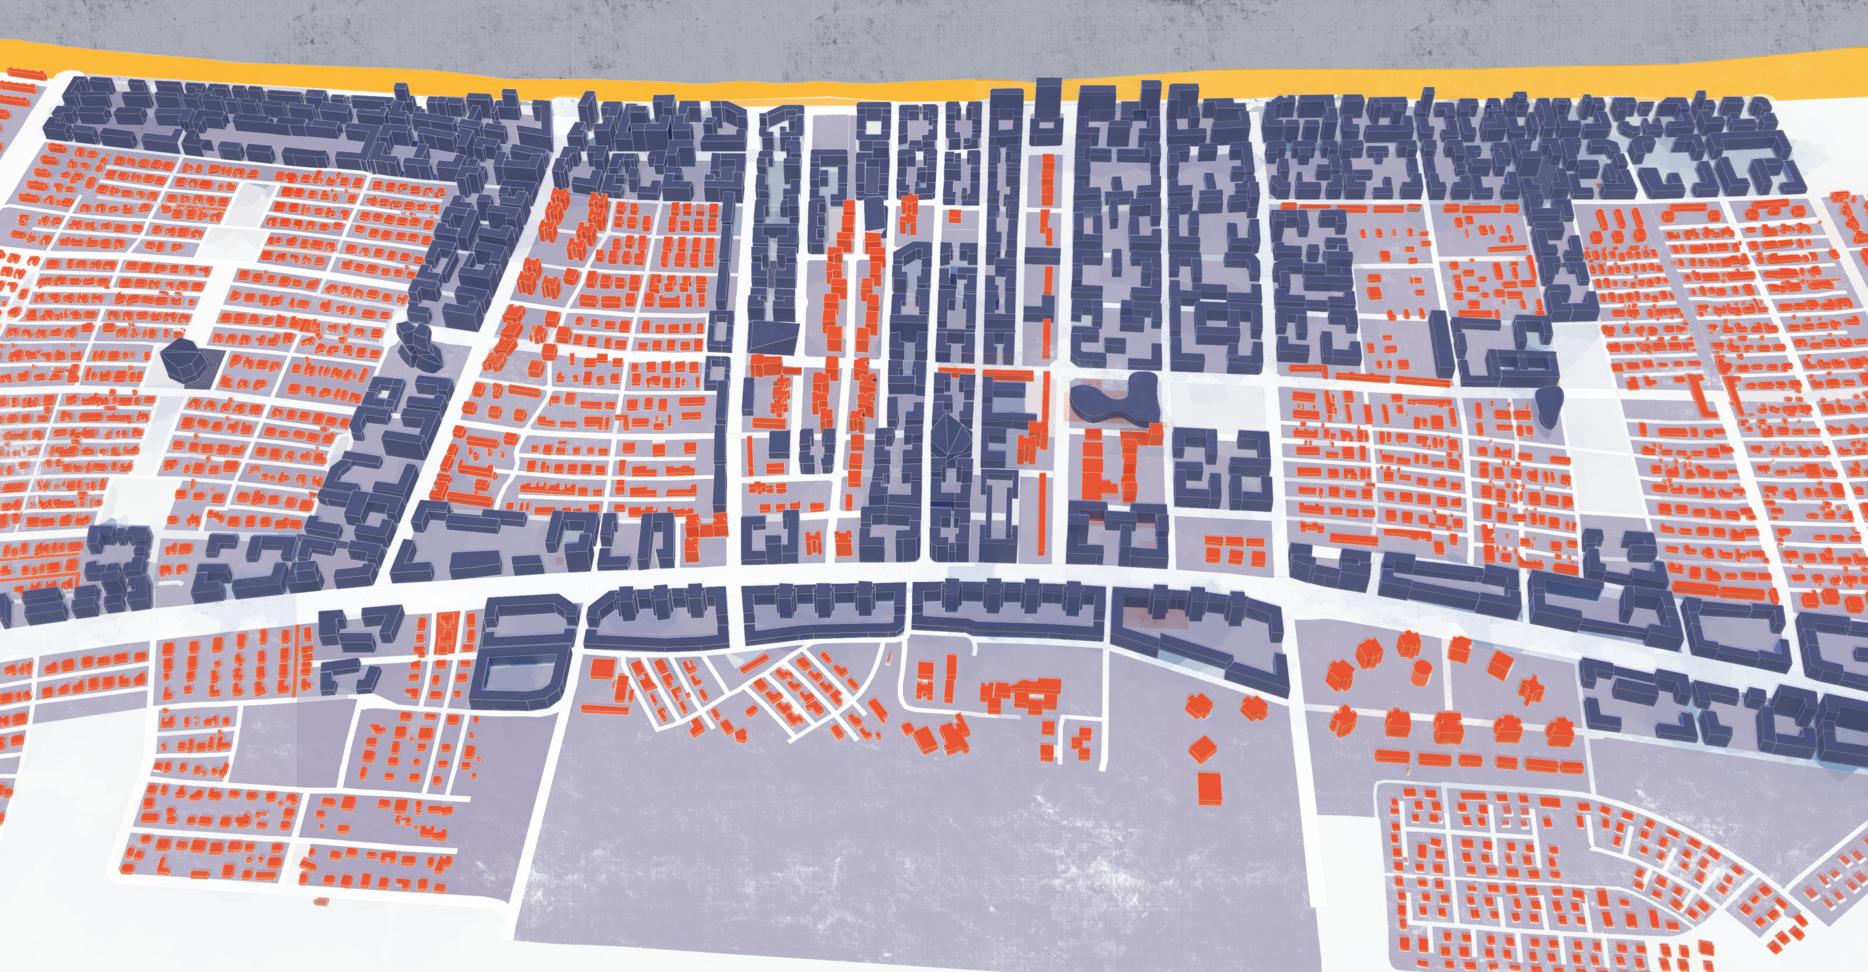 A CITY DEVELOPING TO THE SEA   _  Urban planning, Kiryat Yam, Haifa region 2014